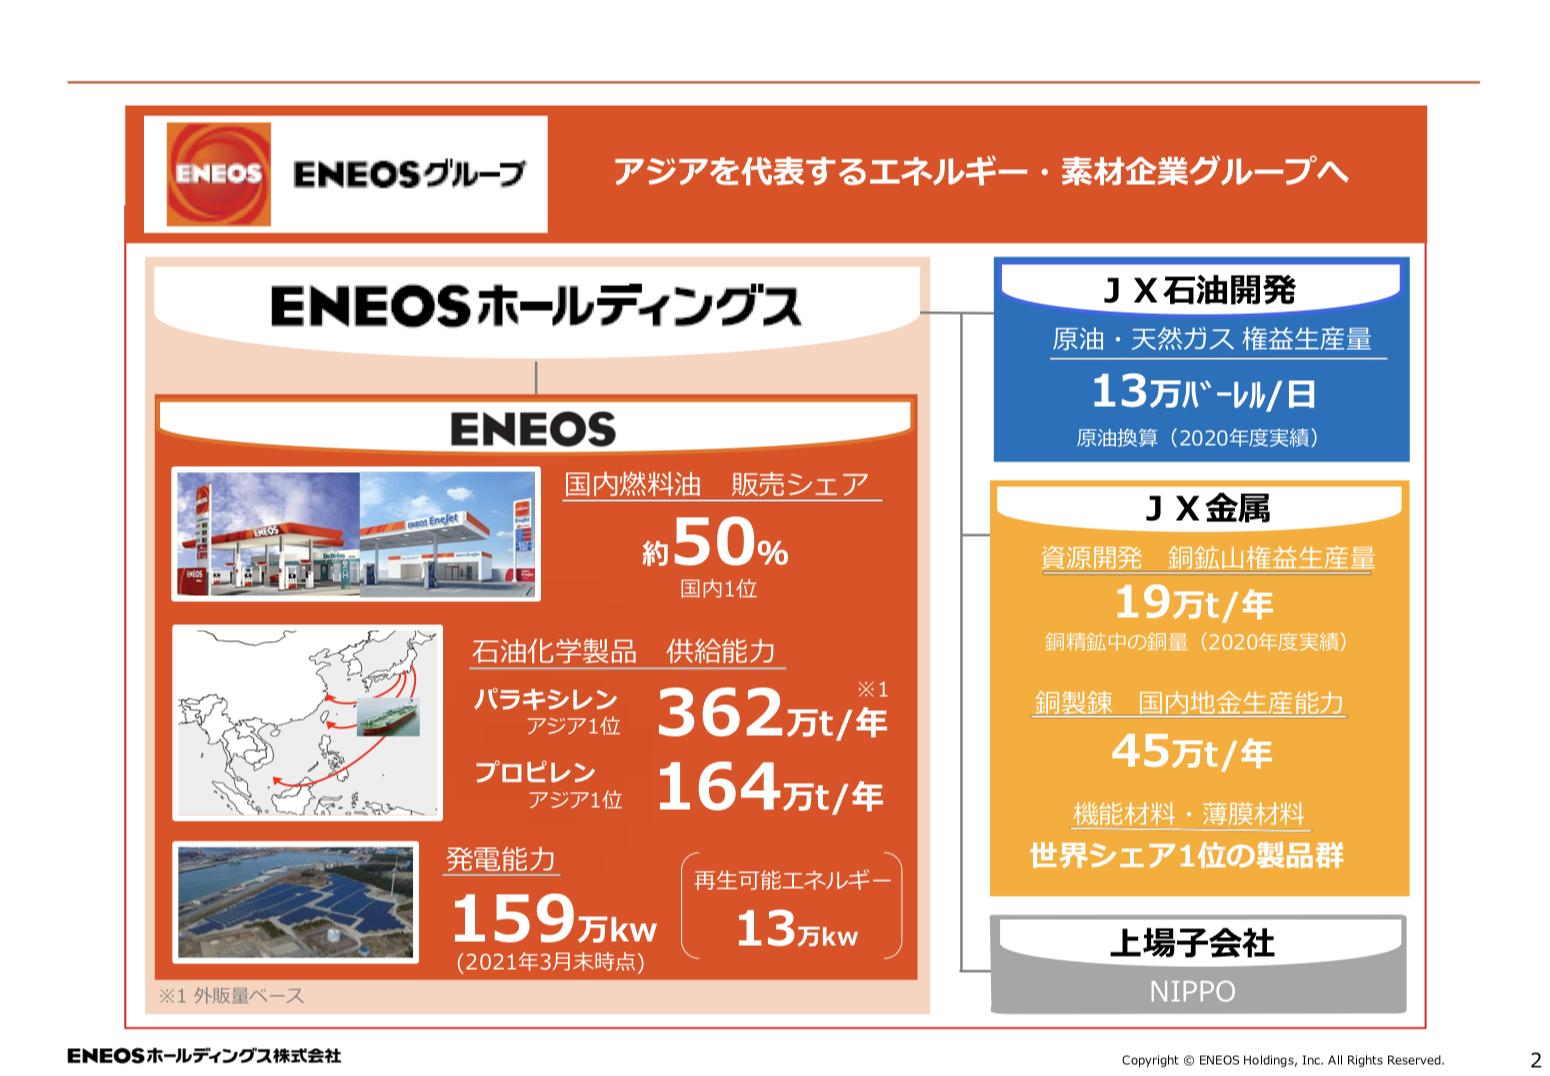 ENEOSホールディングス株式会社 参考資料集 ~ ENEOSグループ ~